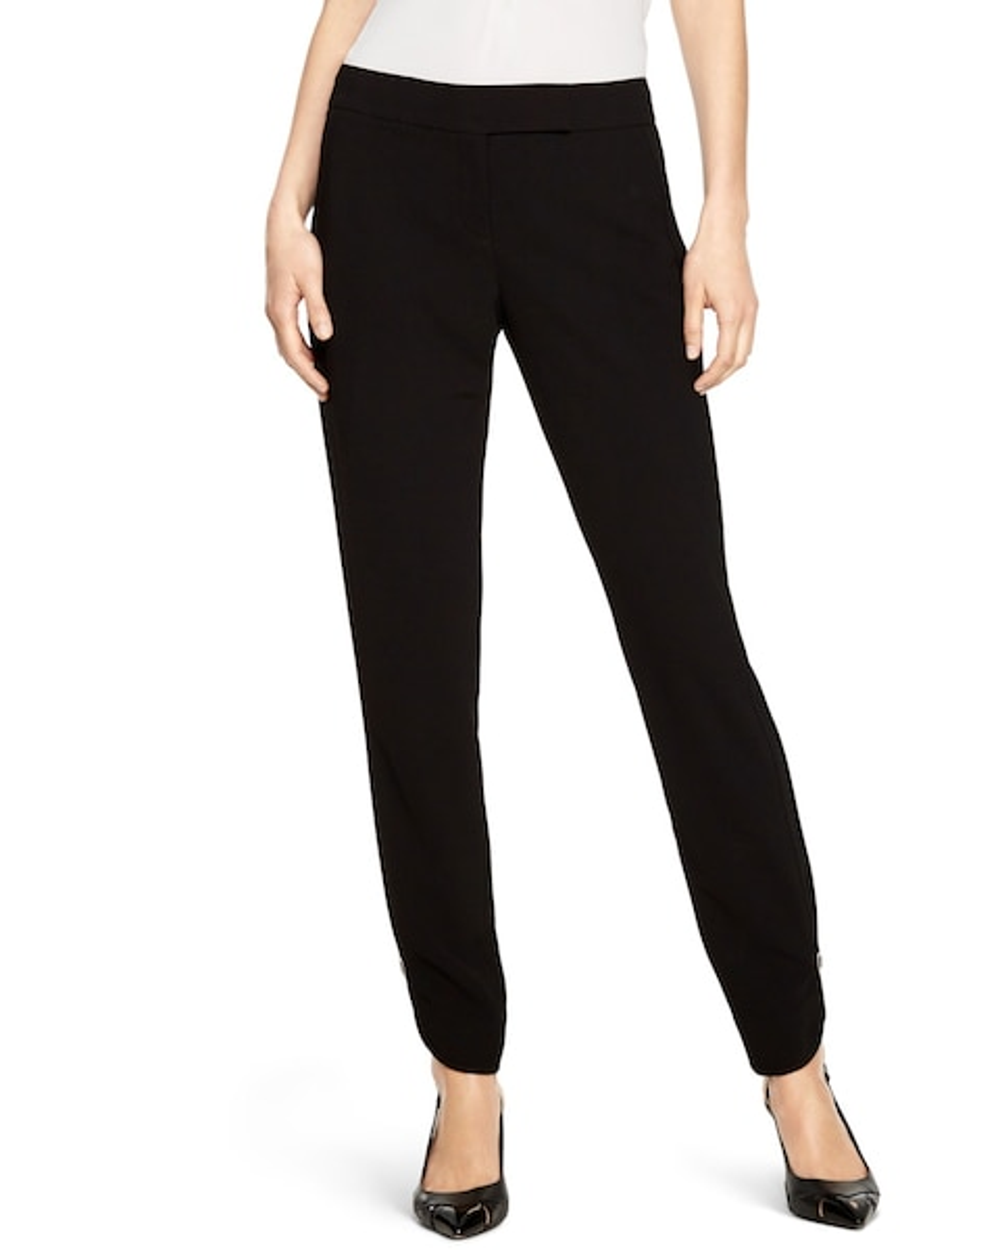 Soft Drape Tapered Black Ankle Pants - WHBM